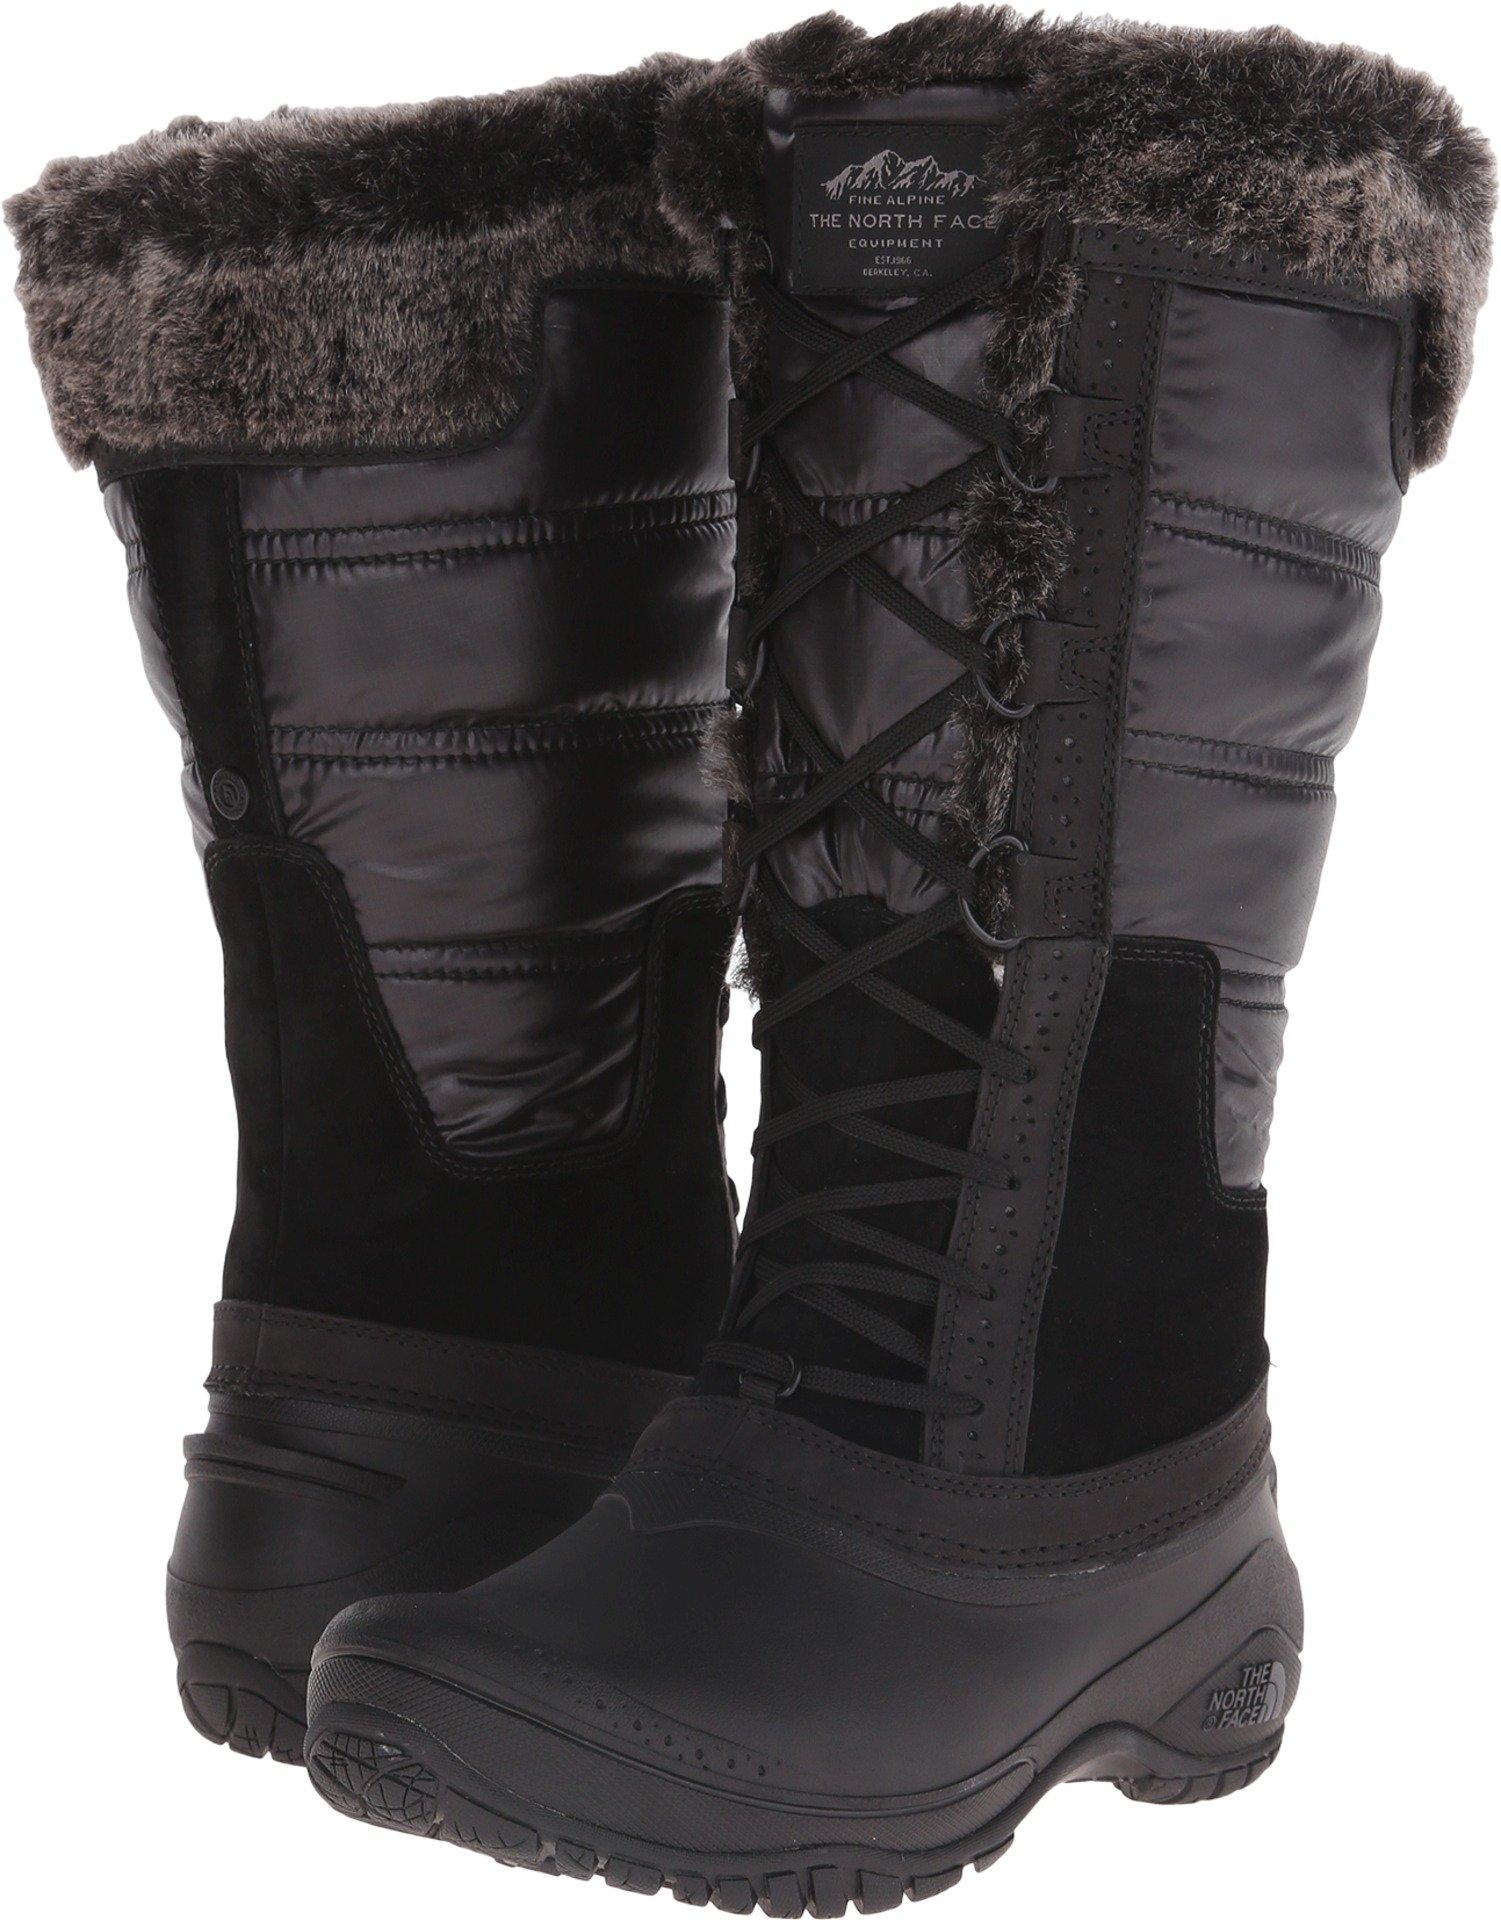 The North Face Shellista Ii Tall Tnf Black/Plum Kitten Grey Womens Winter Boot (8.5)